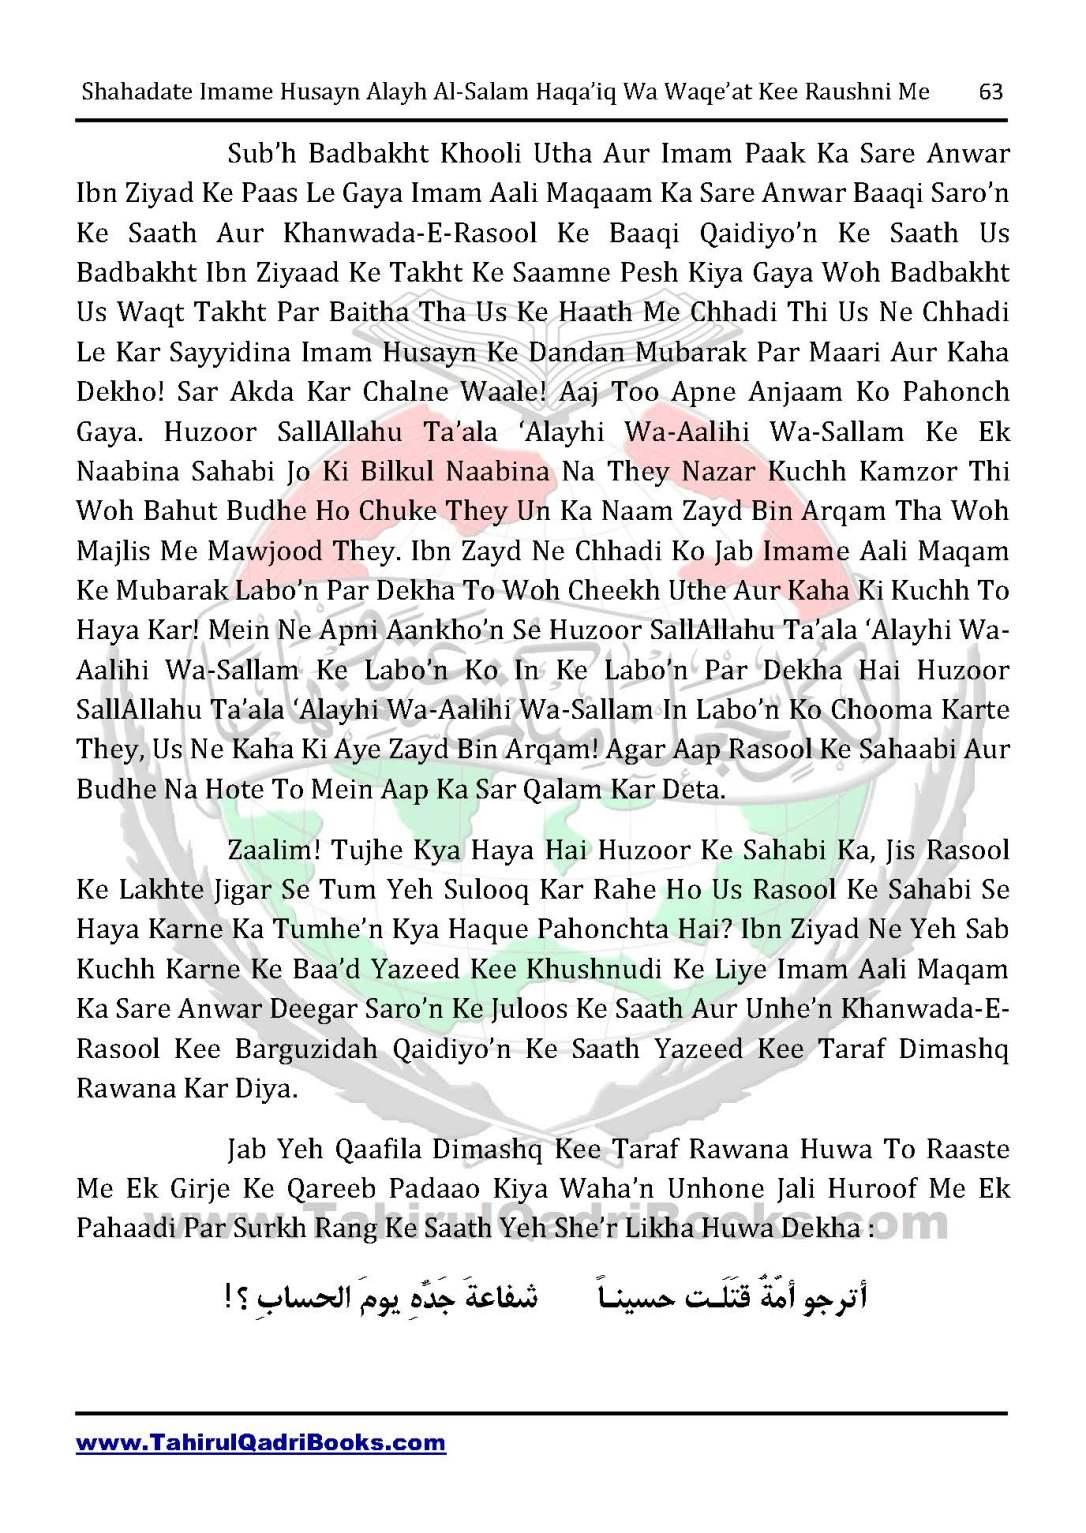 shahadate-imame-husayn-alayh-is-salam-haqaiq-wa-waqe_at-kee-raushni-me-in-roman-urdu-unlocked_Page_63